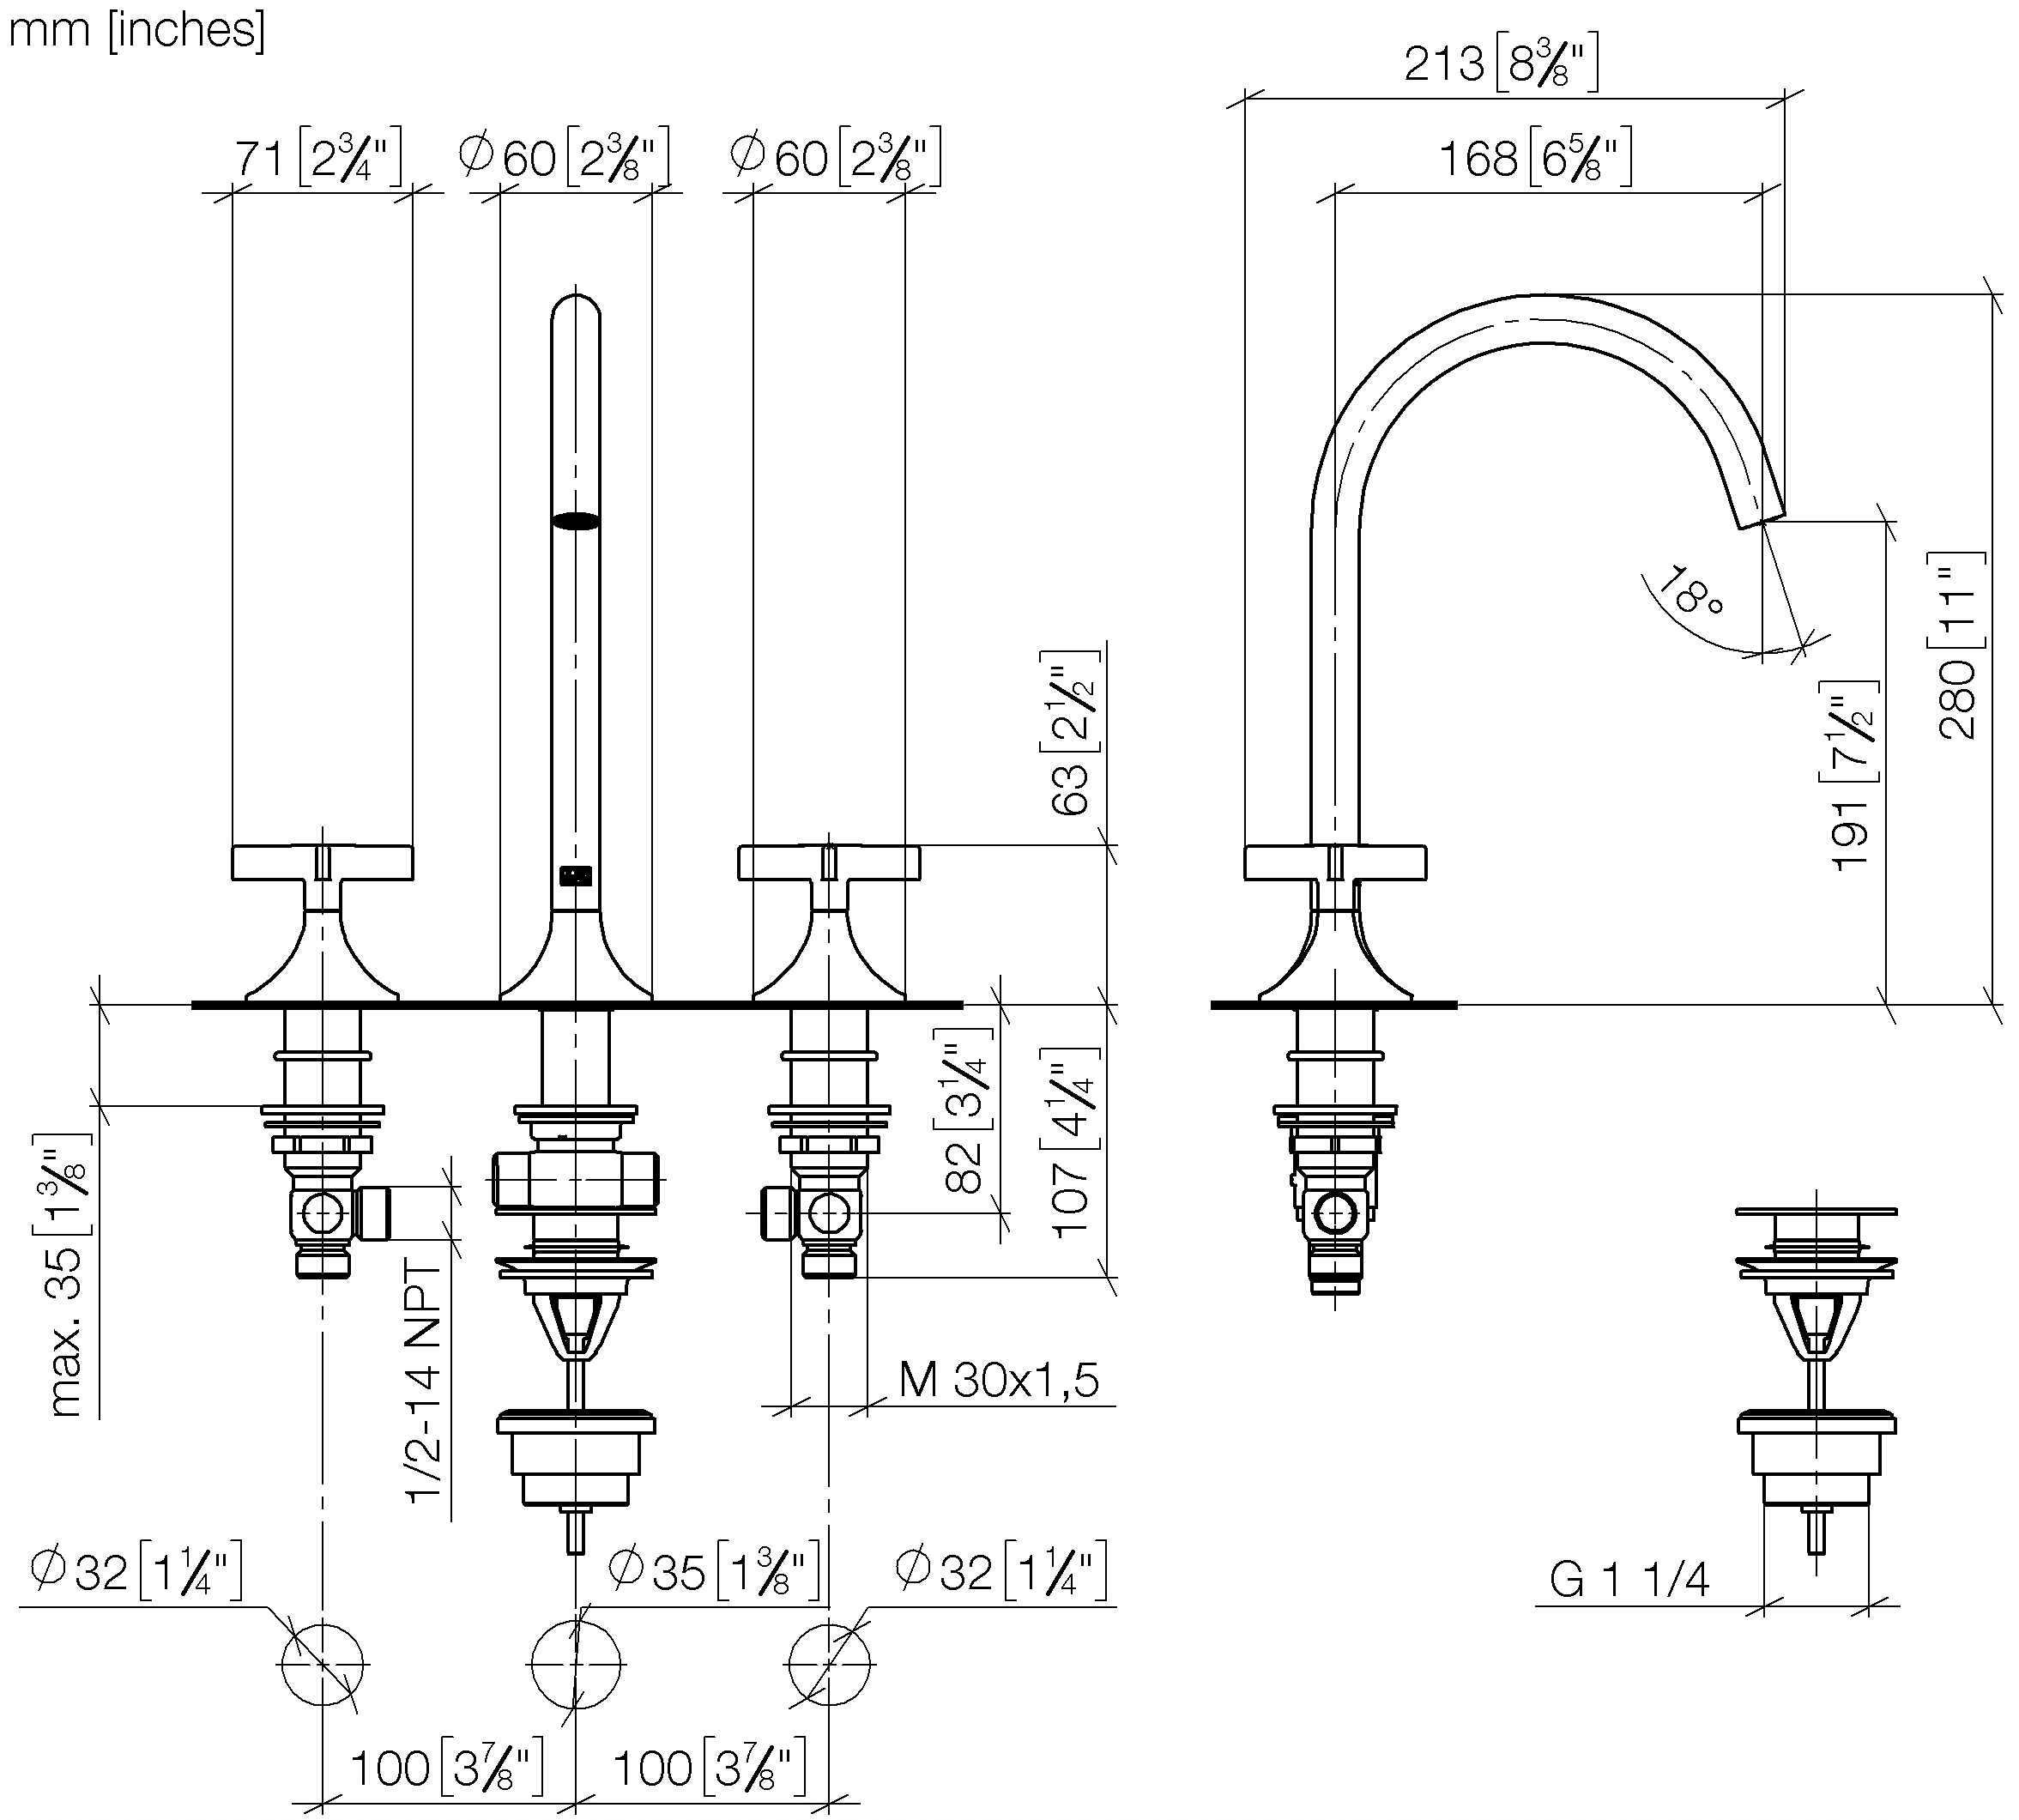 HSS-E Right Hand Cut 8-32 WIDIA GTDVTSFT5024 VariTap VTSFT50 Multipurpose Tap Semi Bottom Chamfer TiCN Coating WIDIA Products Group 5357379 3 Flutes